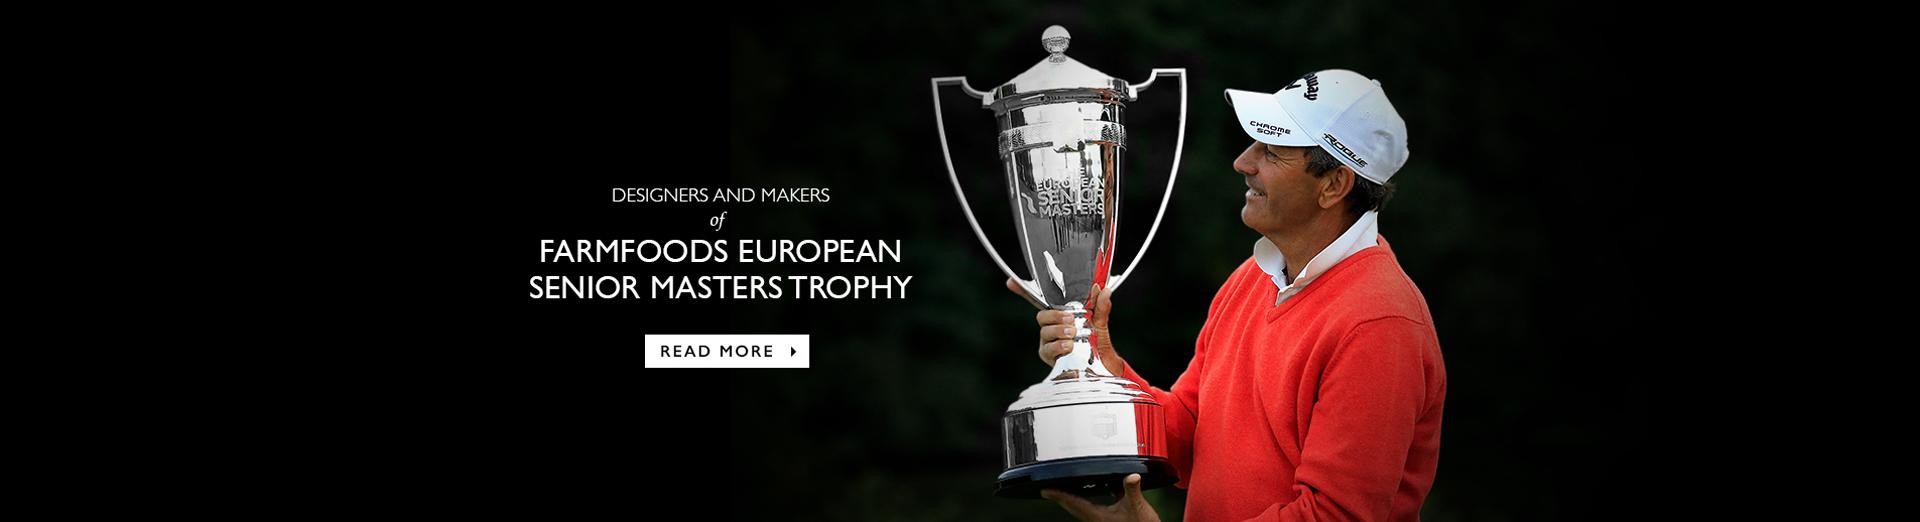 European Senior Masters